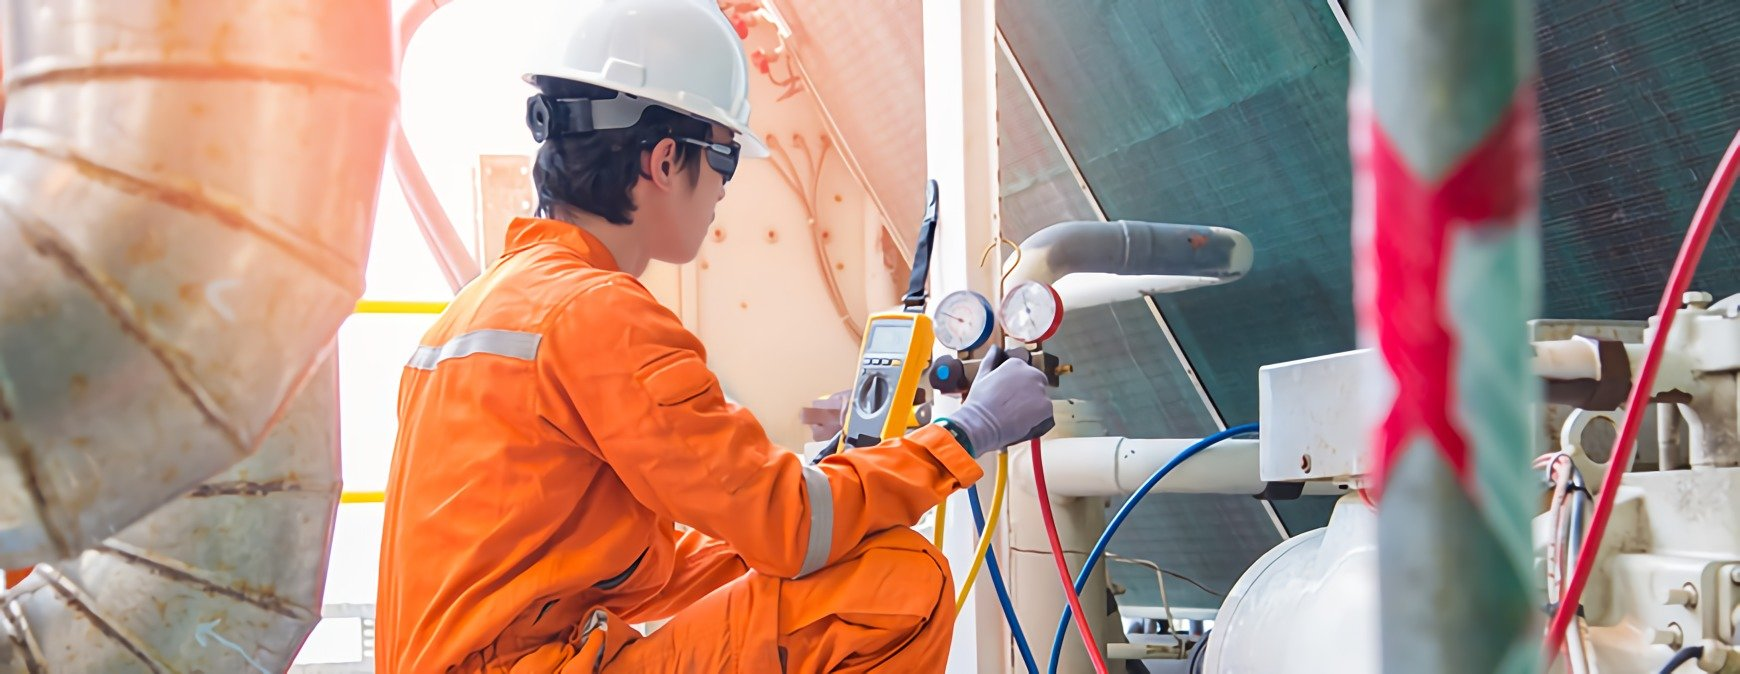 HVAC Technician versus HVAC Engineer Career Paths - Refrigeration School,  Inc. (RSI)